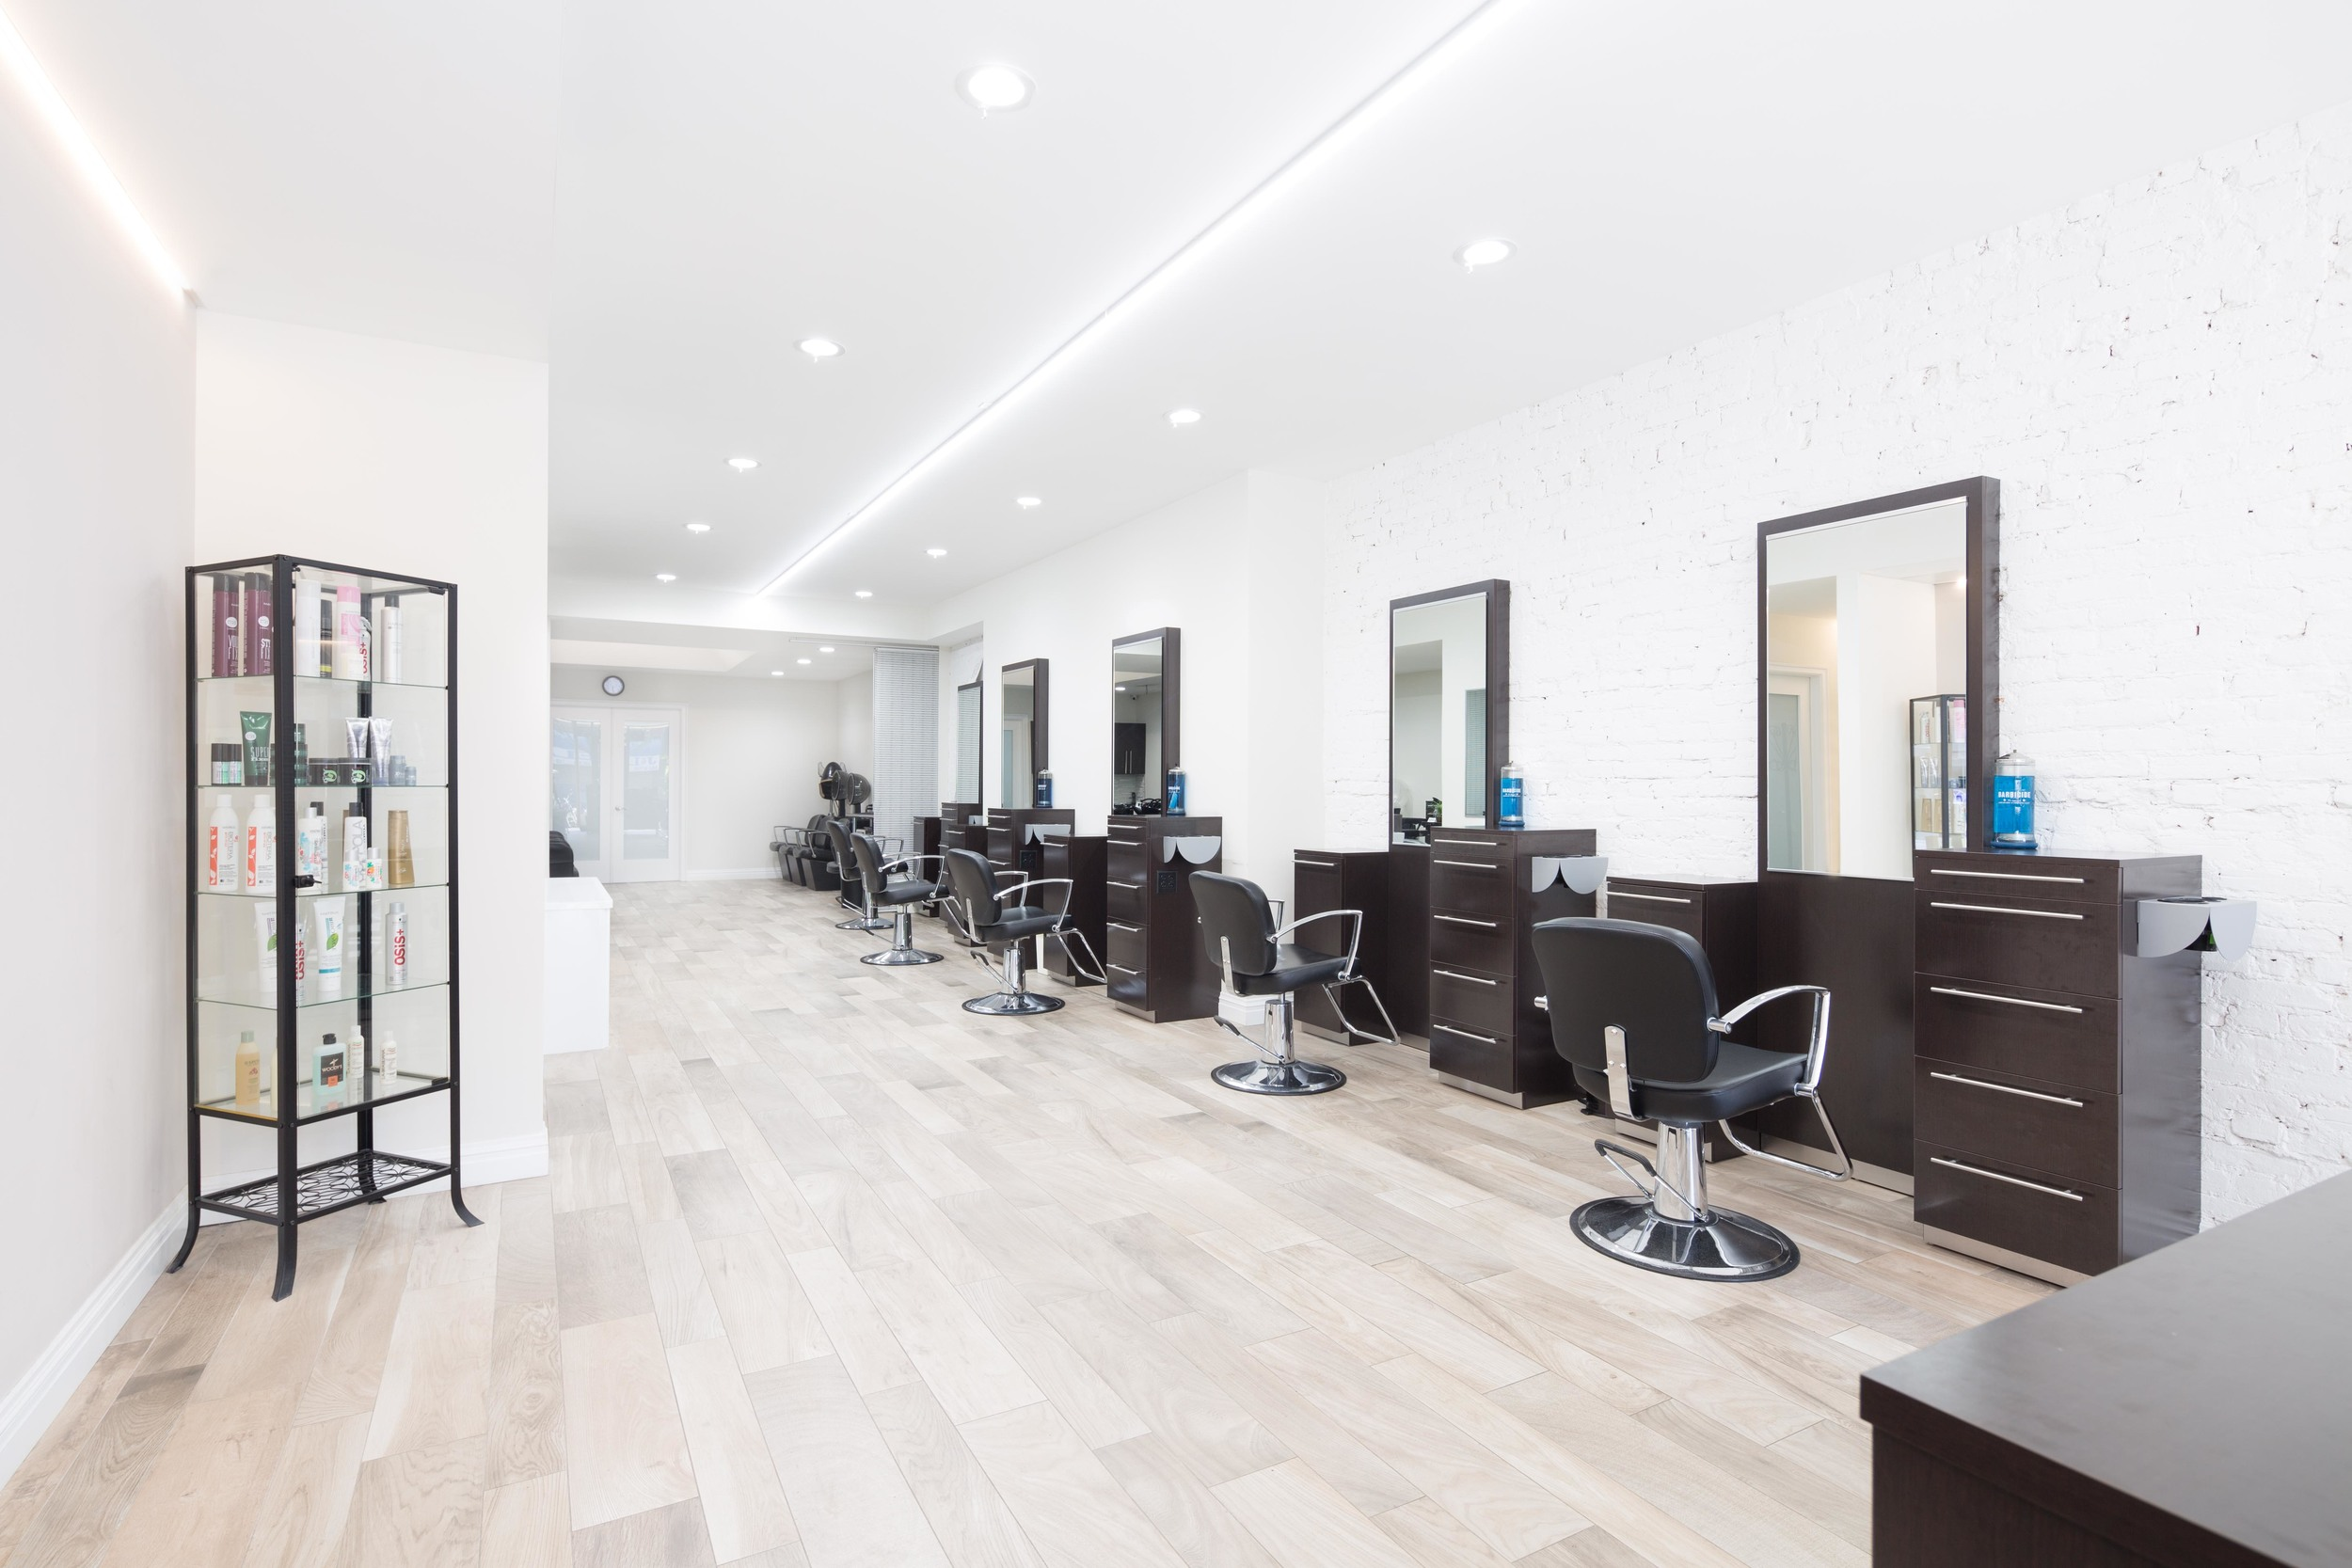 Hair Fair Salon   684 5th Ave, Brooklyn, NY 11215  Client:Giancola Contractors Inc.